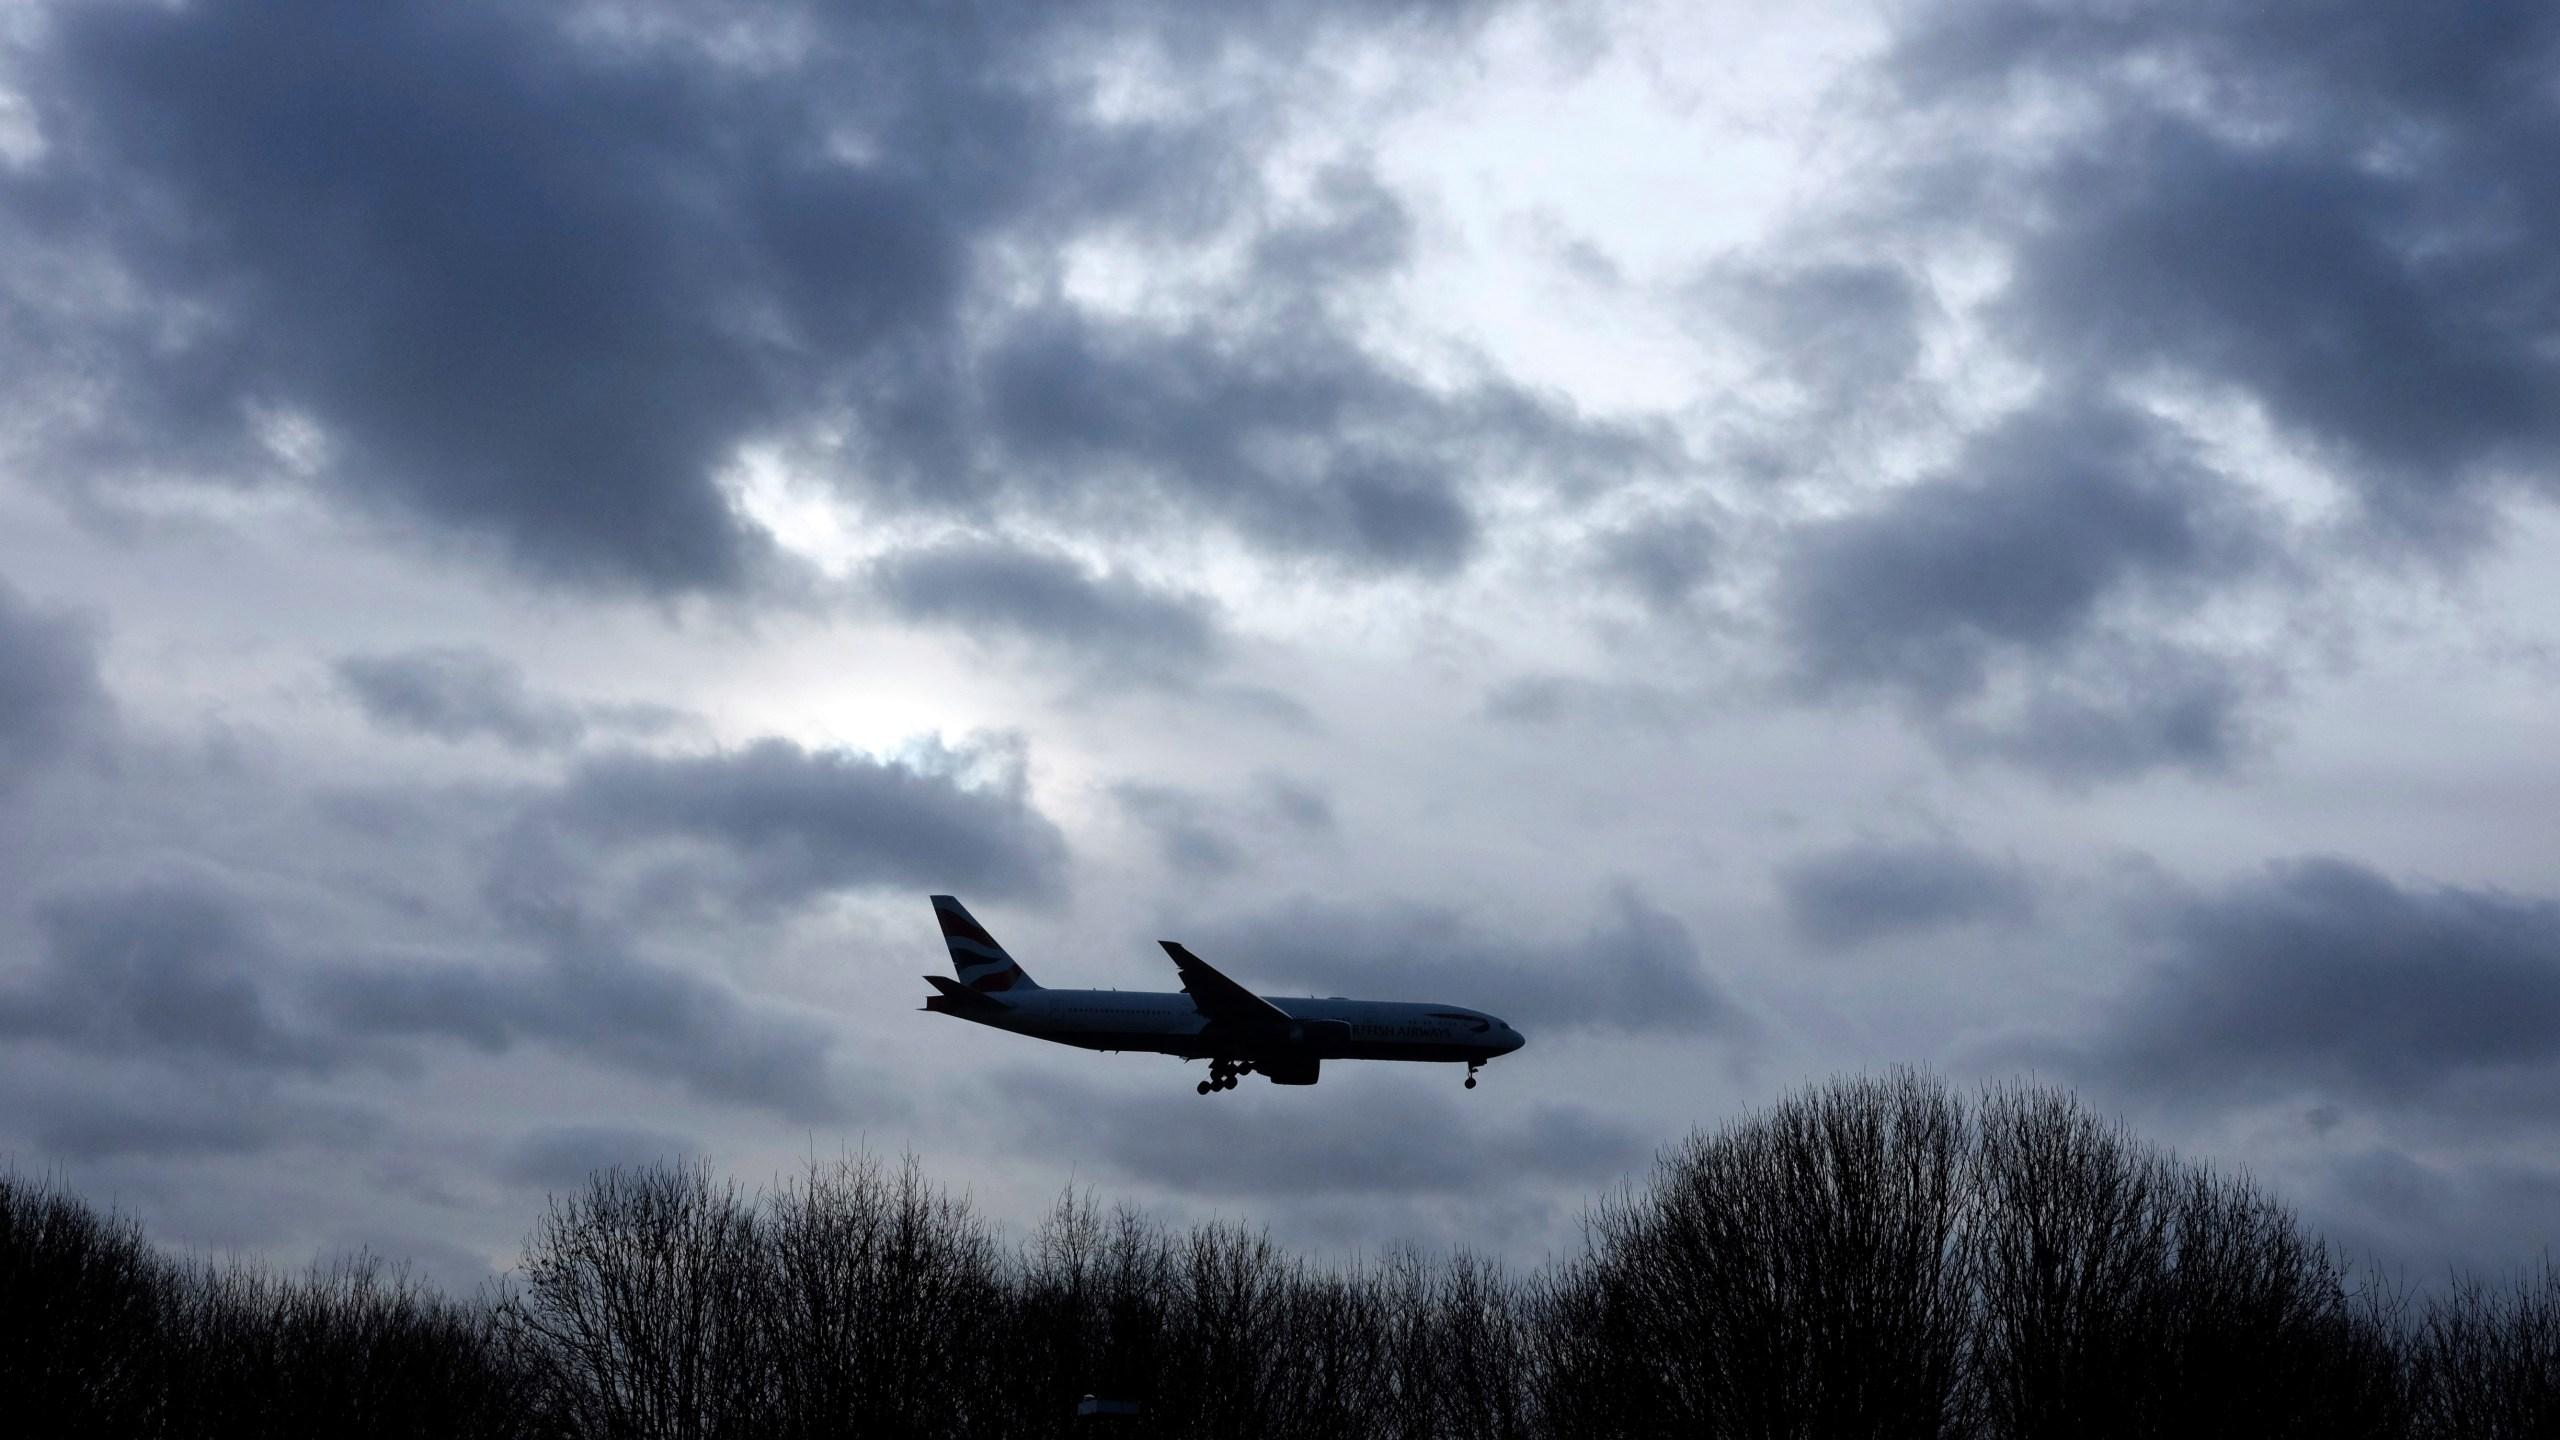 Britain_Gatwick_Airport_Drones_59825-159532.jpg53574779